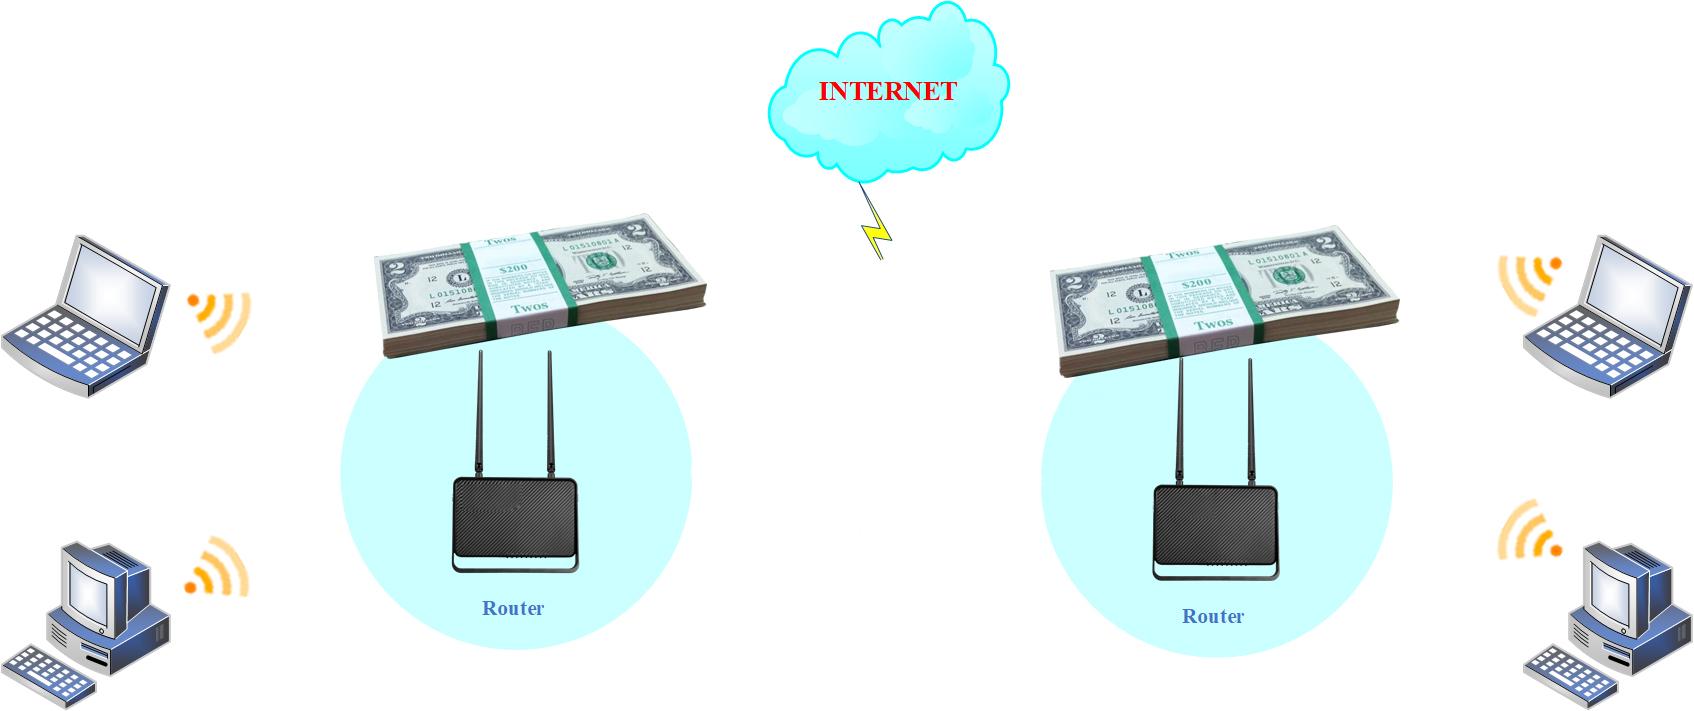 2 Router gây tốn chi phí